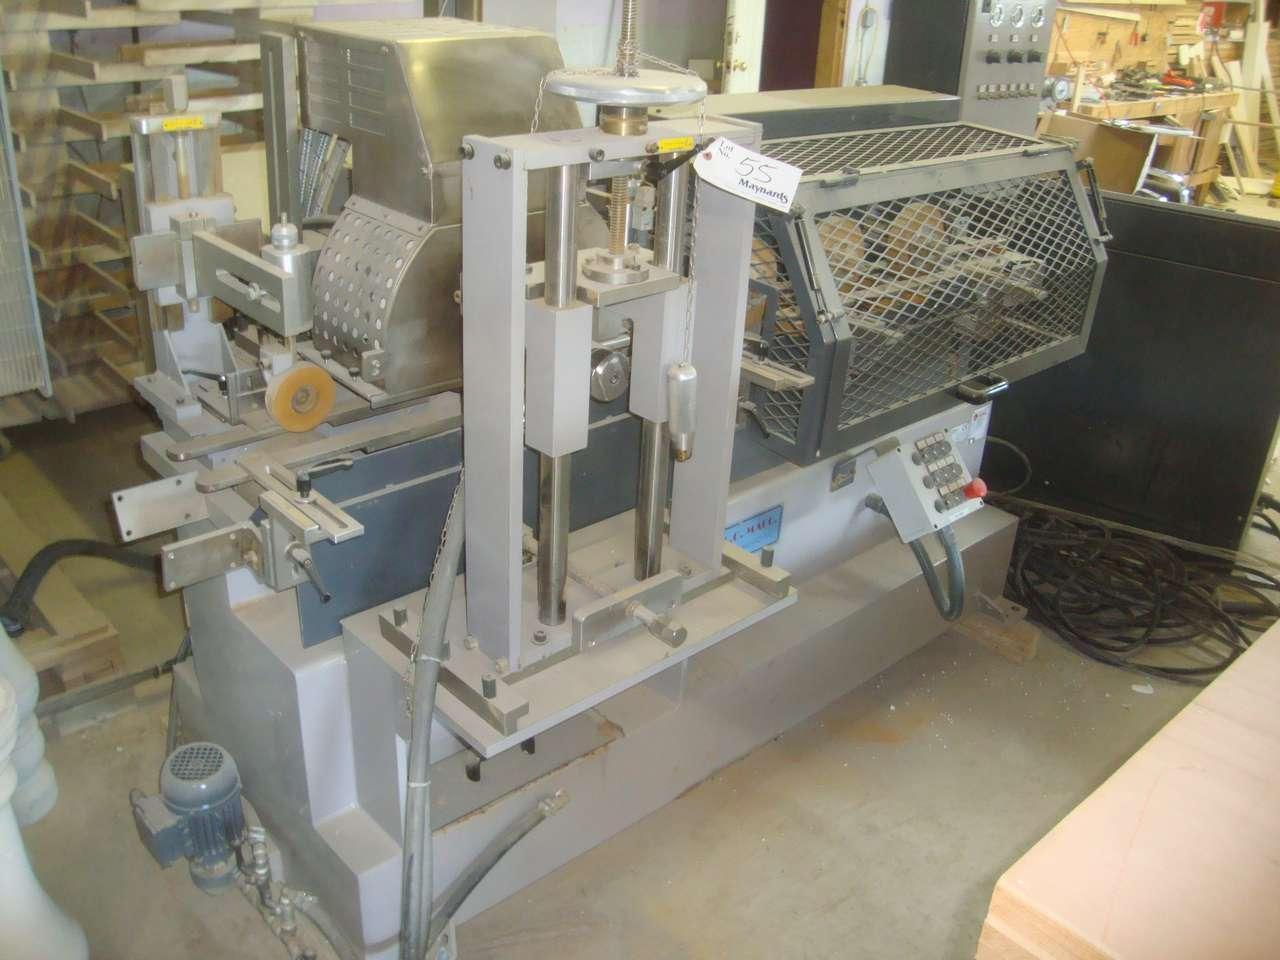 Lot 55 - P.A.O. MACC EMBOSSING Heat embosser system,